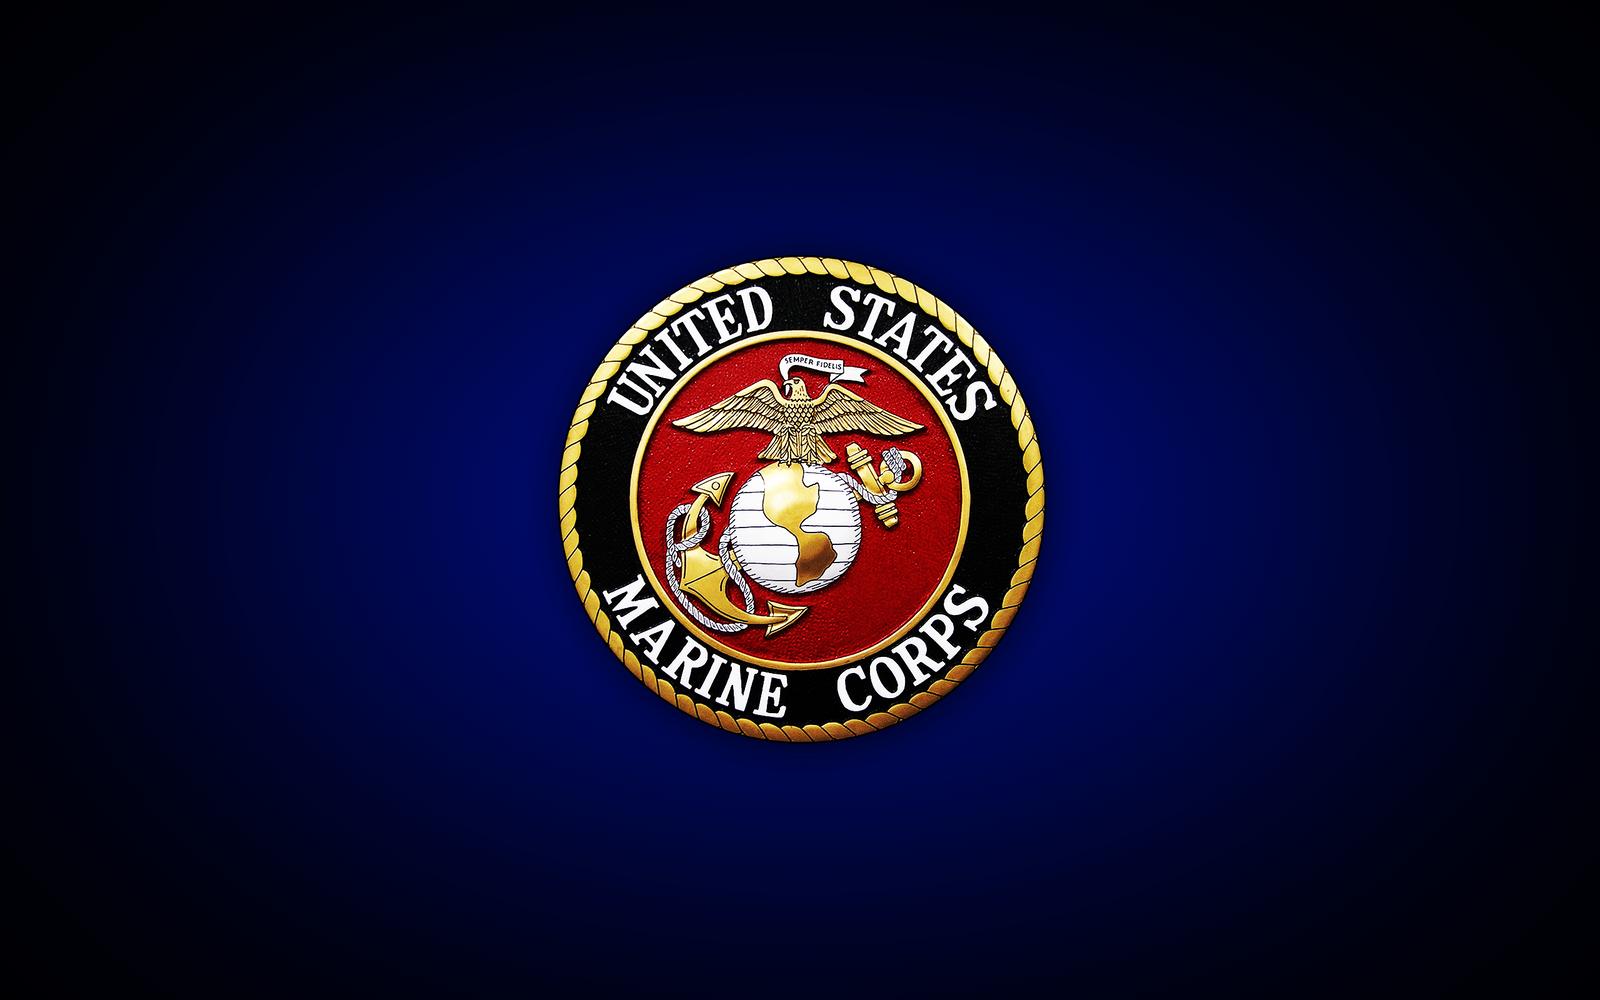 marine logo wallpaper 04 - photo #1